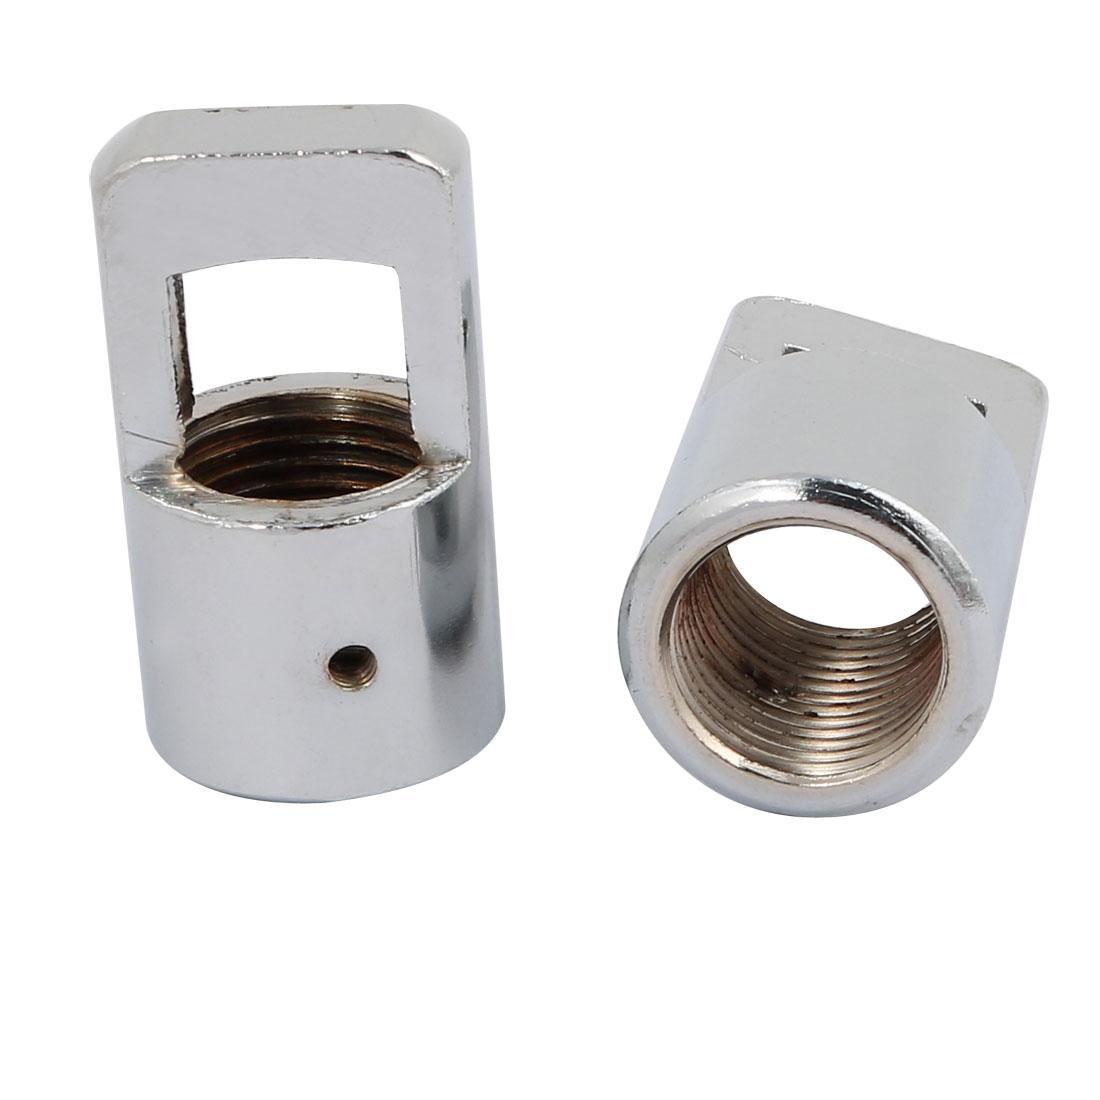 2pcs 27mm x 47mm M19 Female Thread Lamp Loop Ring Chrome Tone for DIY Chandelier